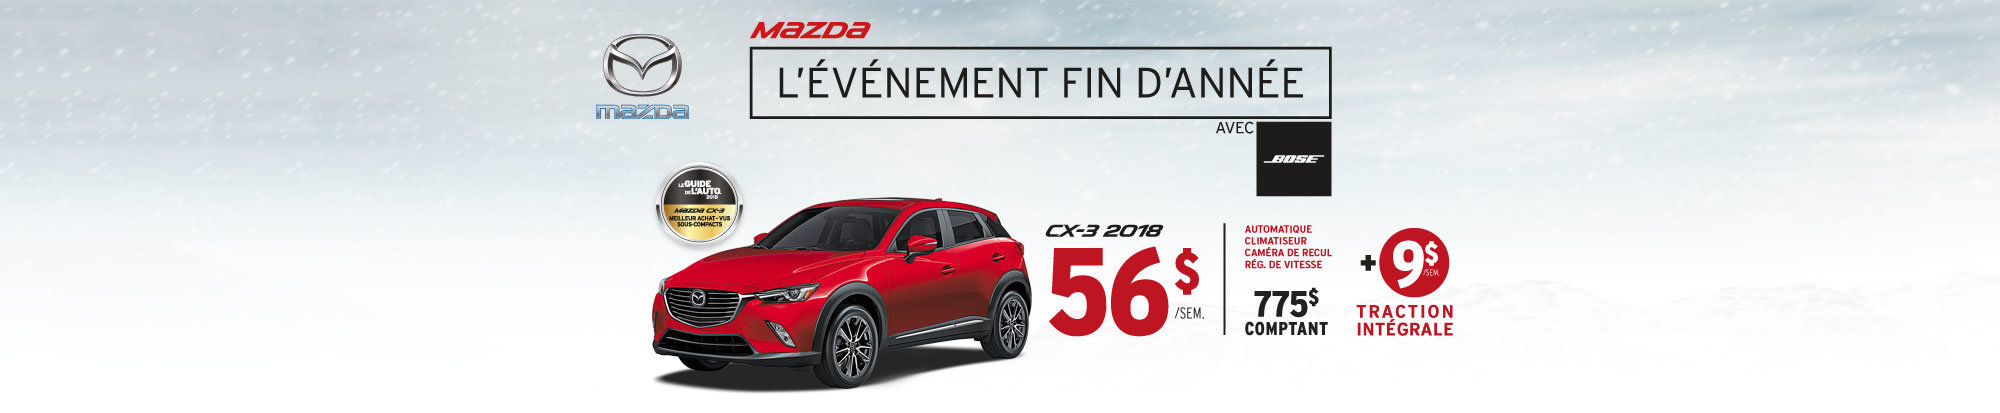 Mazda CX-3 web